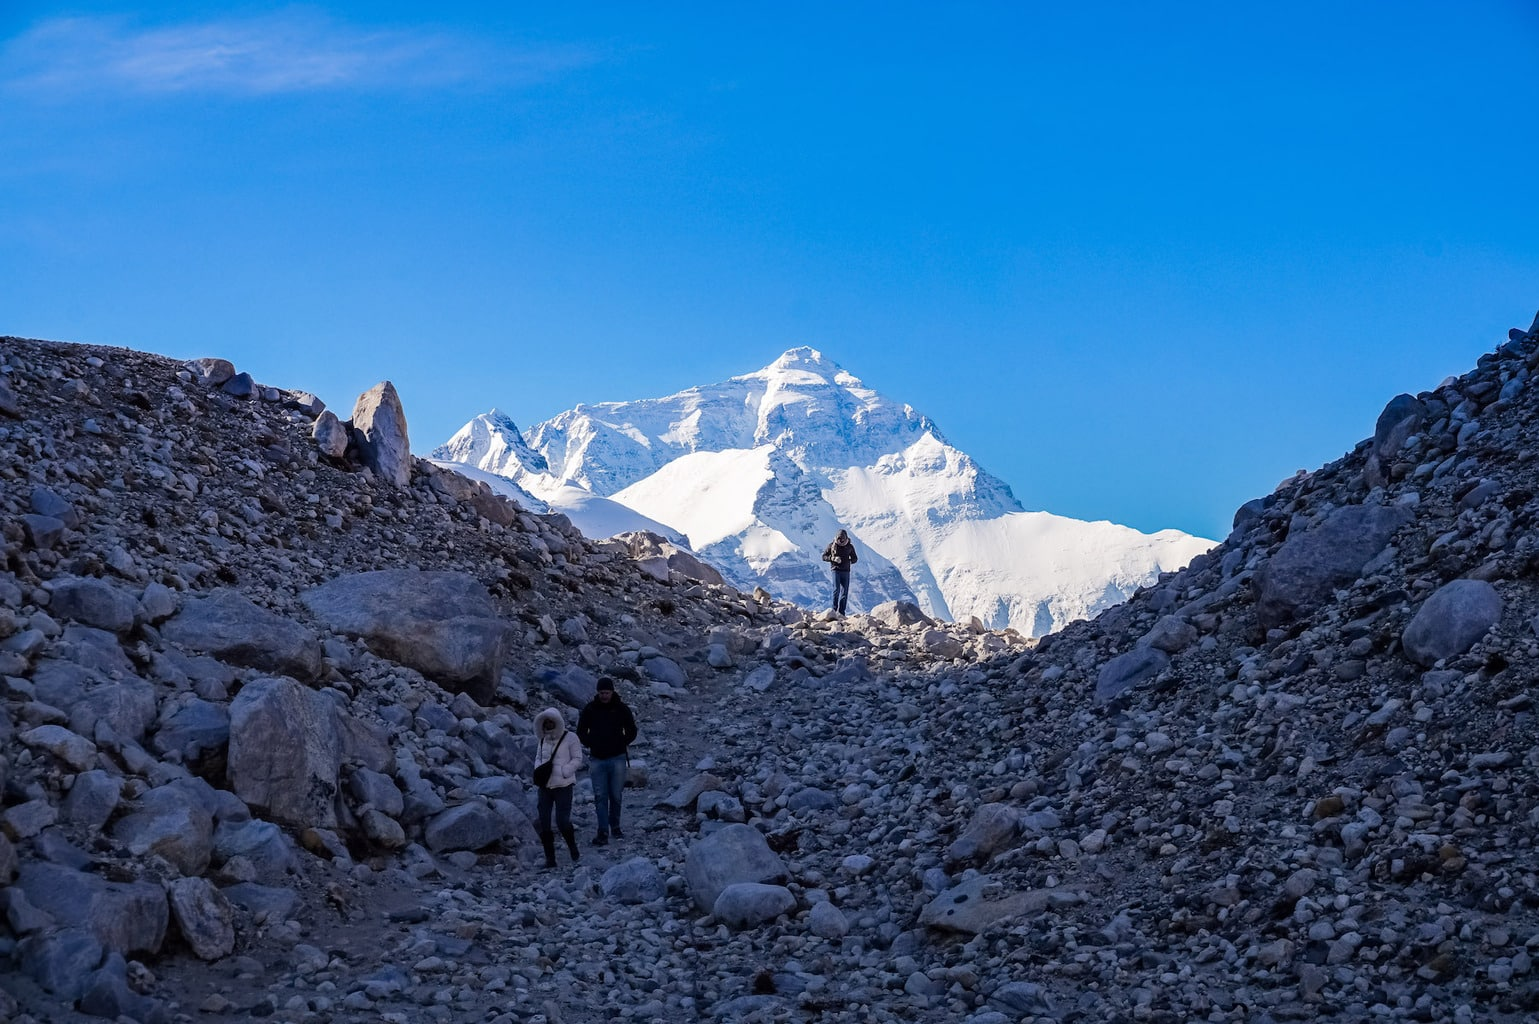 Trekking down from Everest